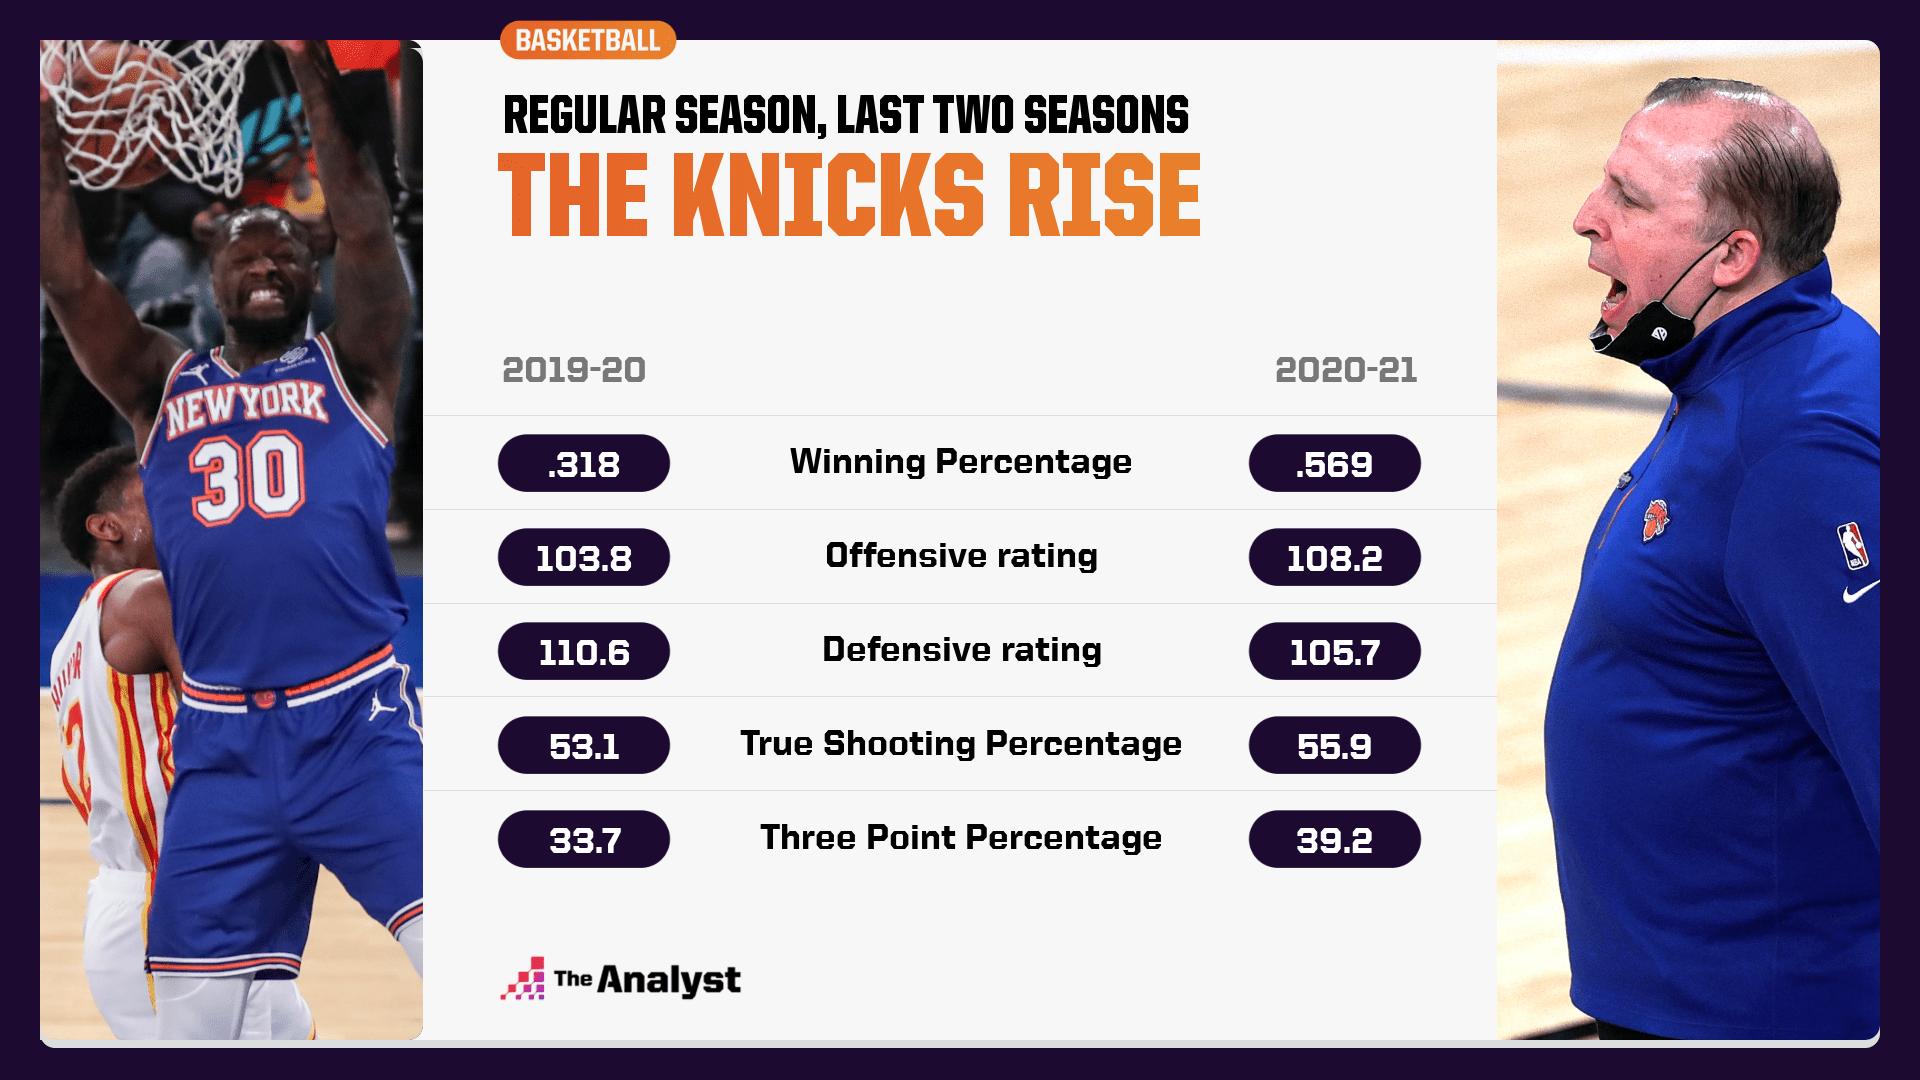 The Knicks improvement